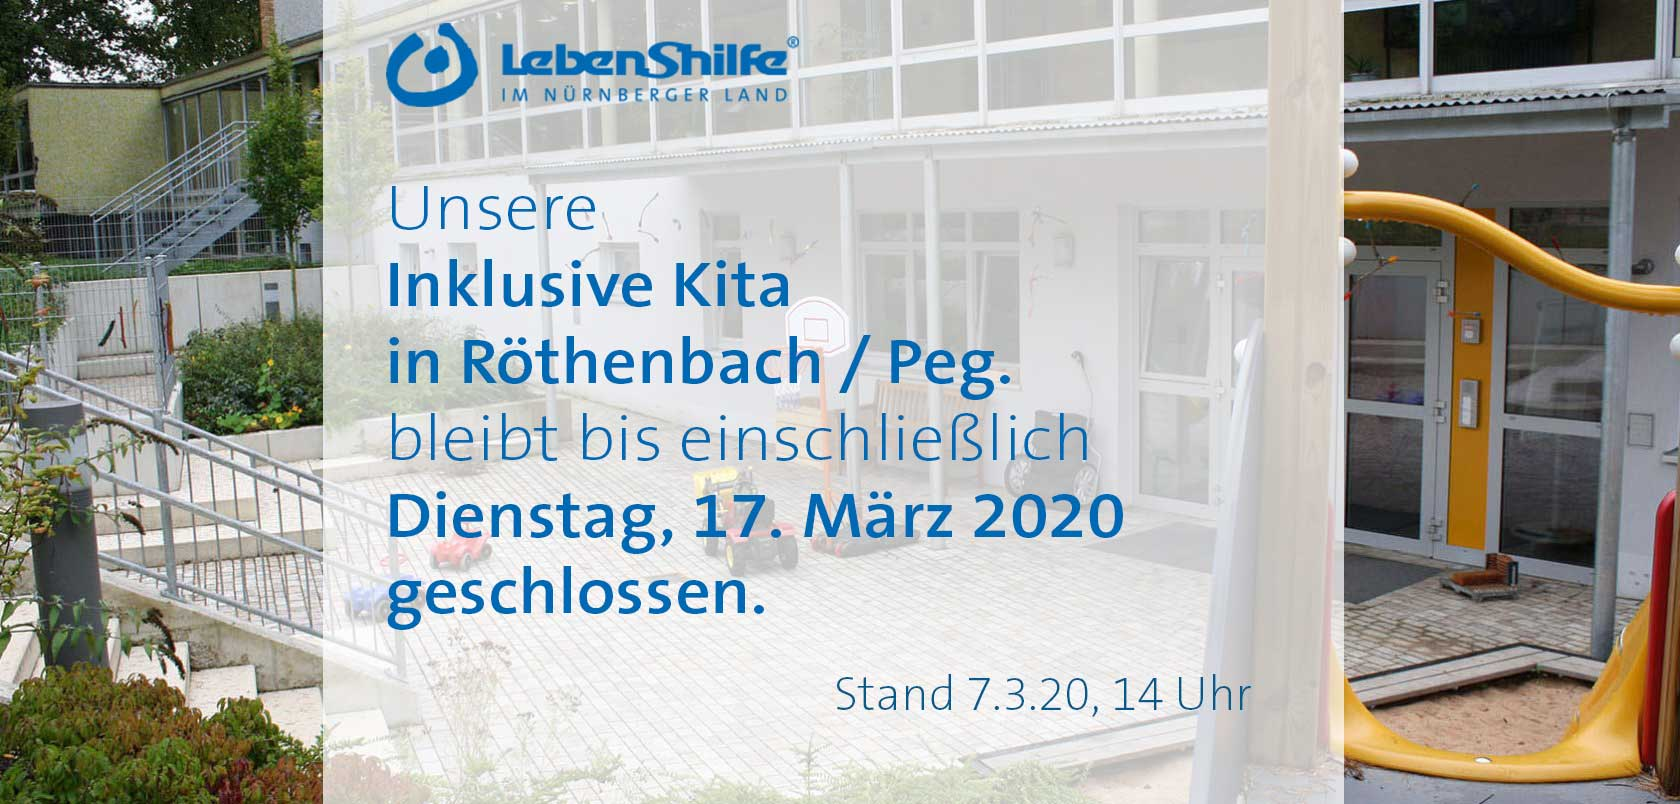 Inklusive Kita Röthenbach / Peg. geschlossen bis 17. März 2020 - Stand 7.3.20, 13.45 Uhr